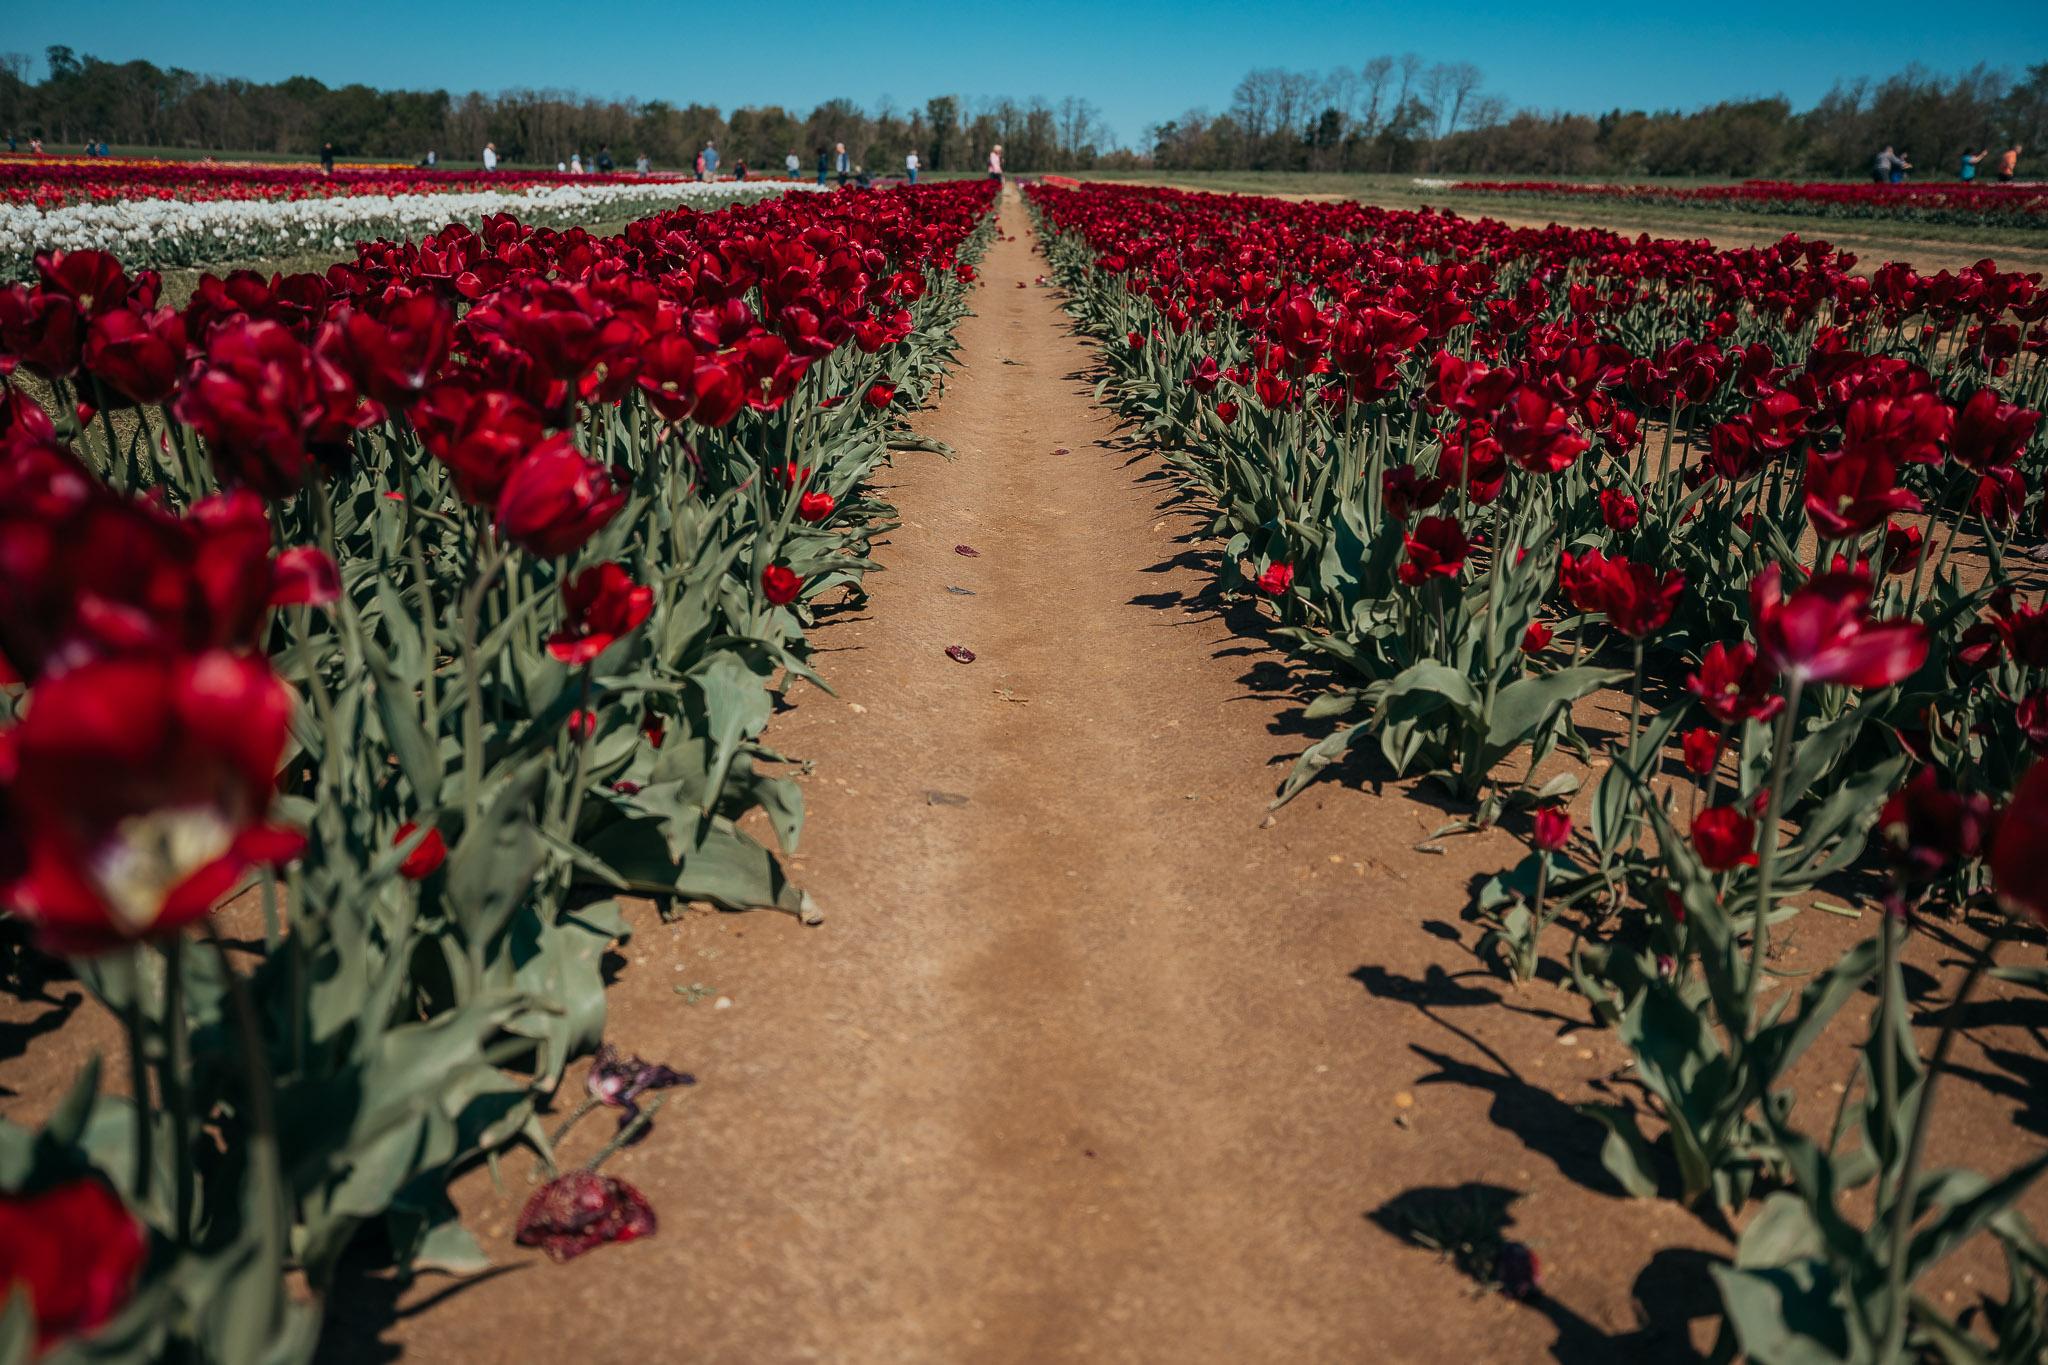 Tulips-4855.jpg